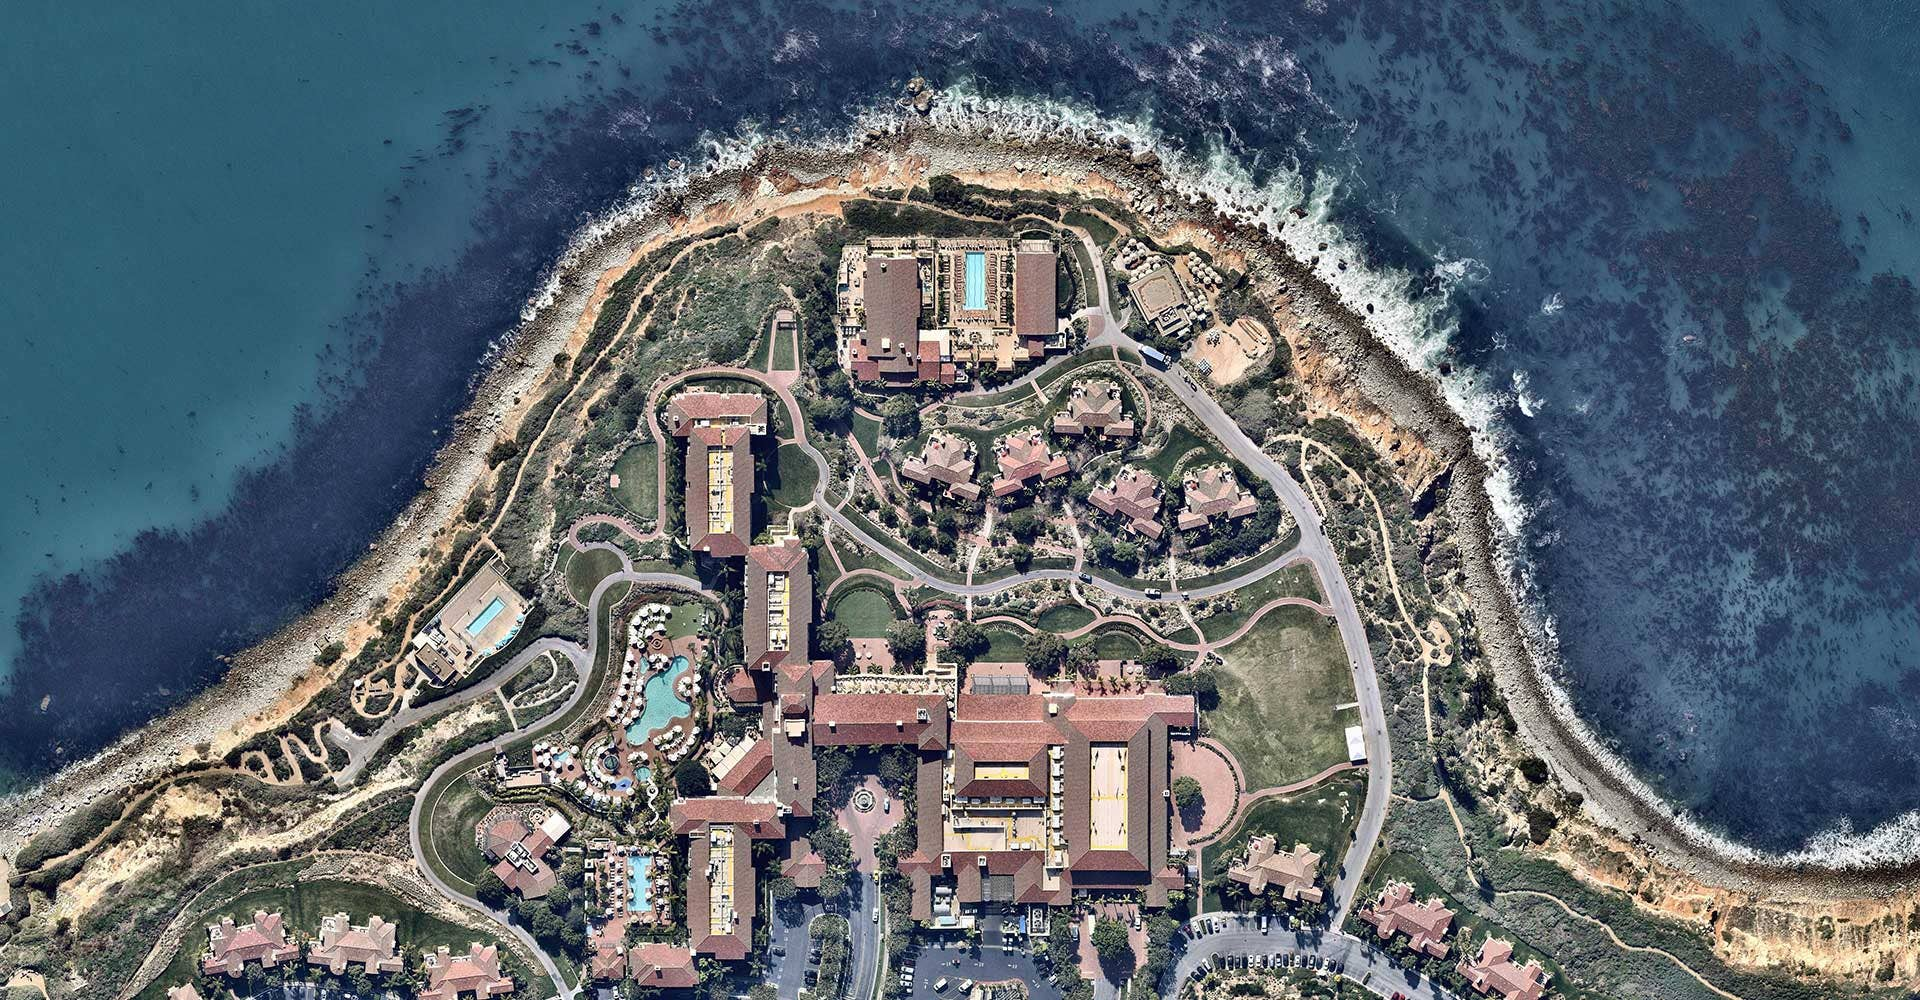 High resolution aerial image of resort in Rancho Palos Verdes, California